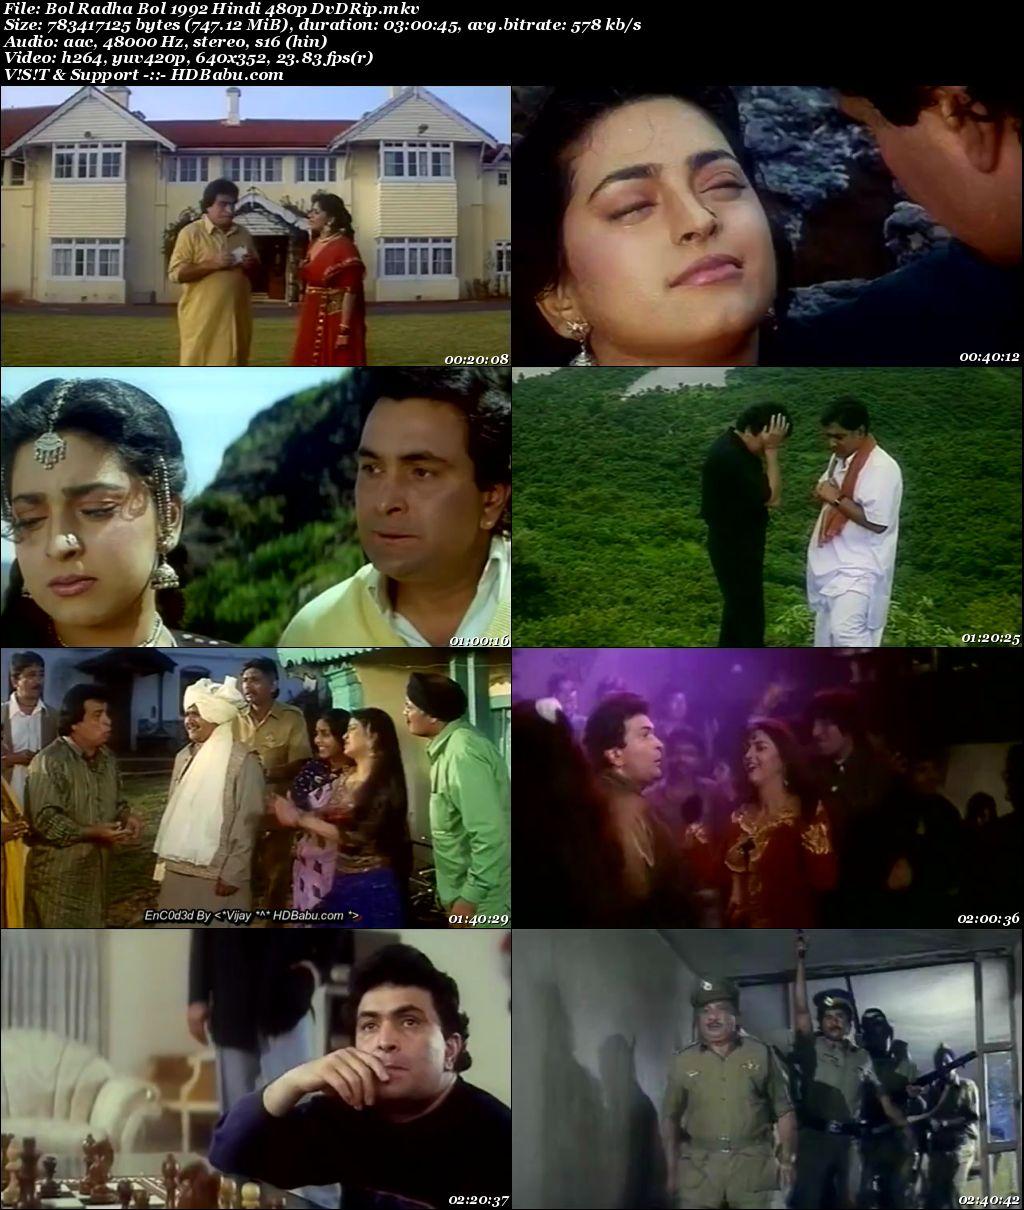 Bol Radha Bol Full Movie Download